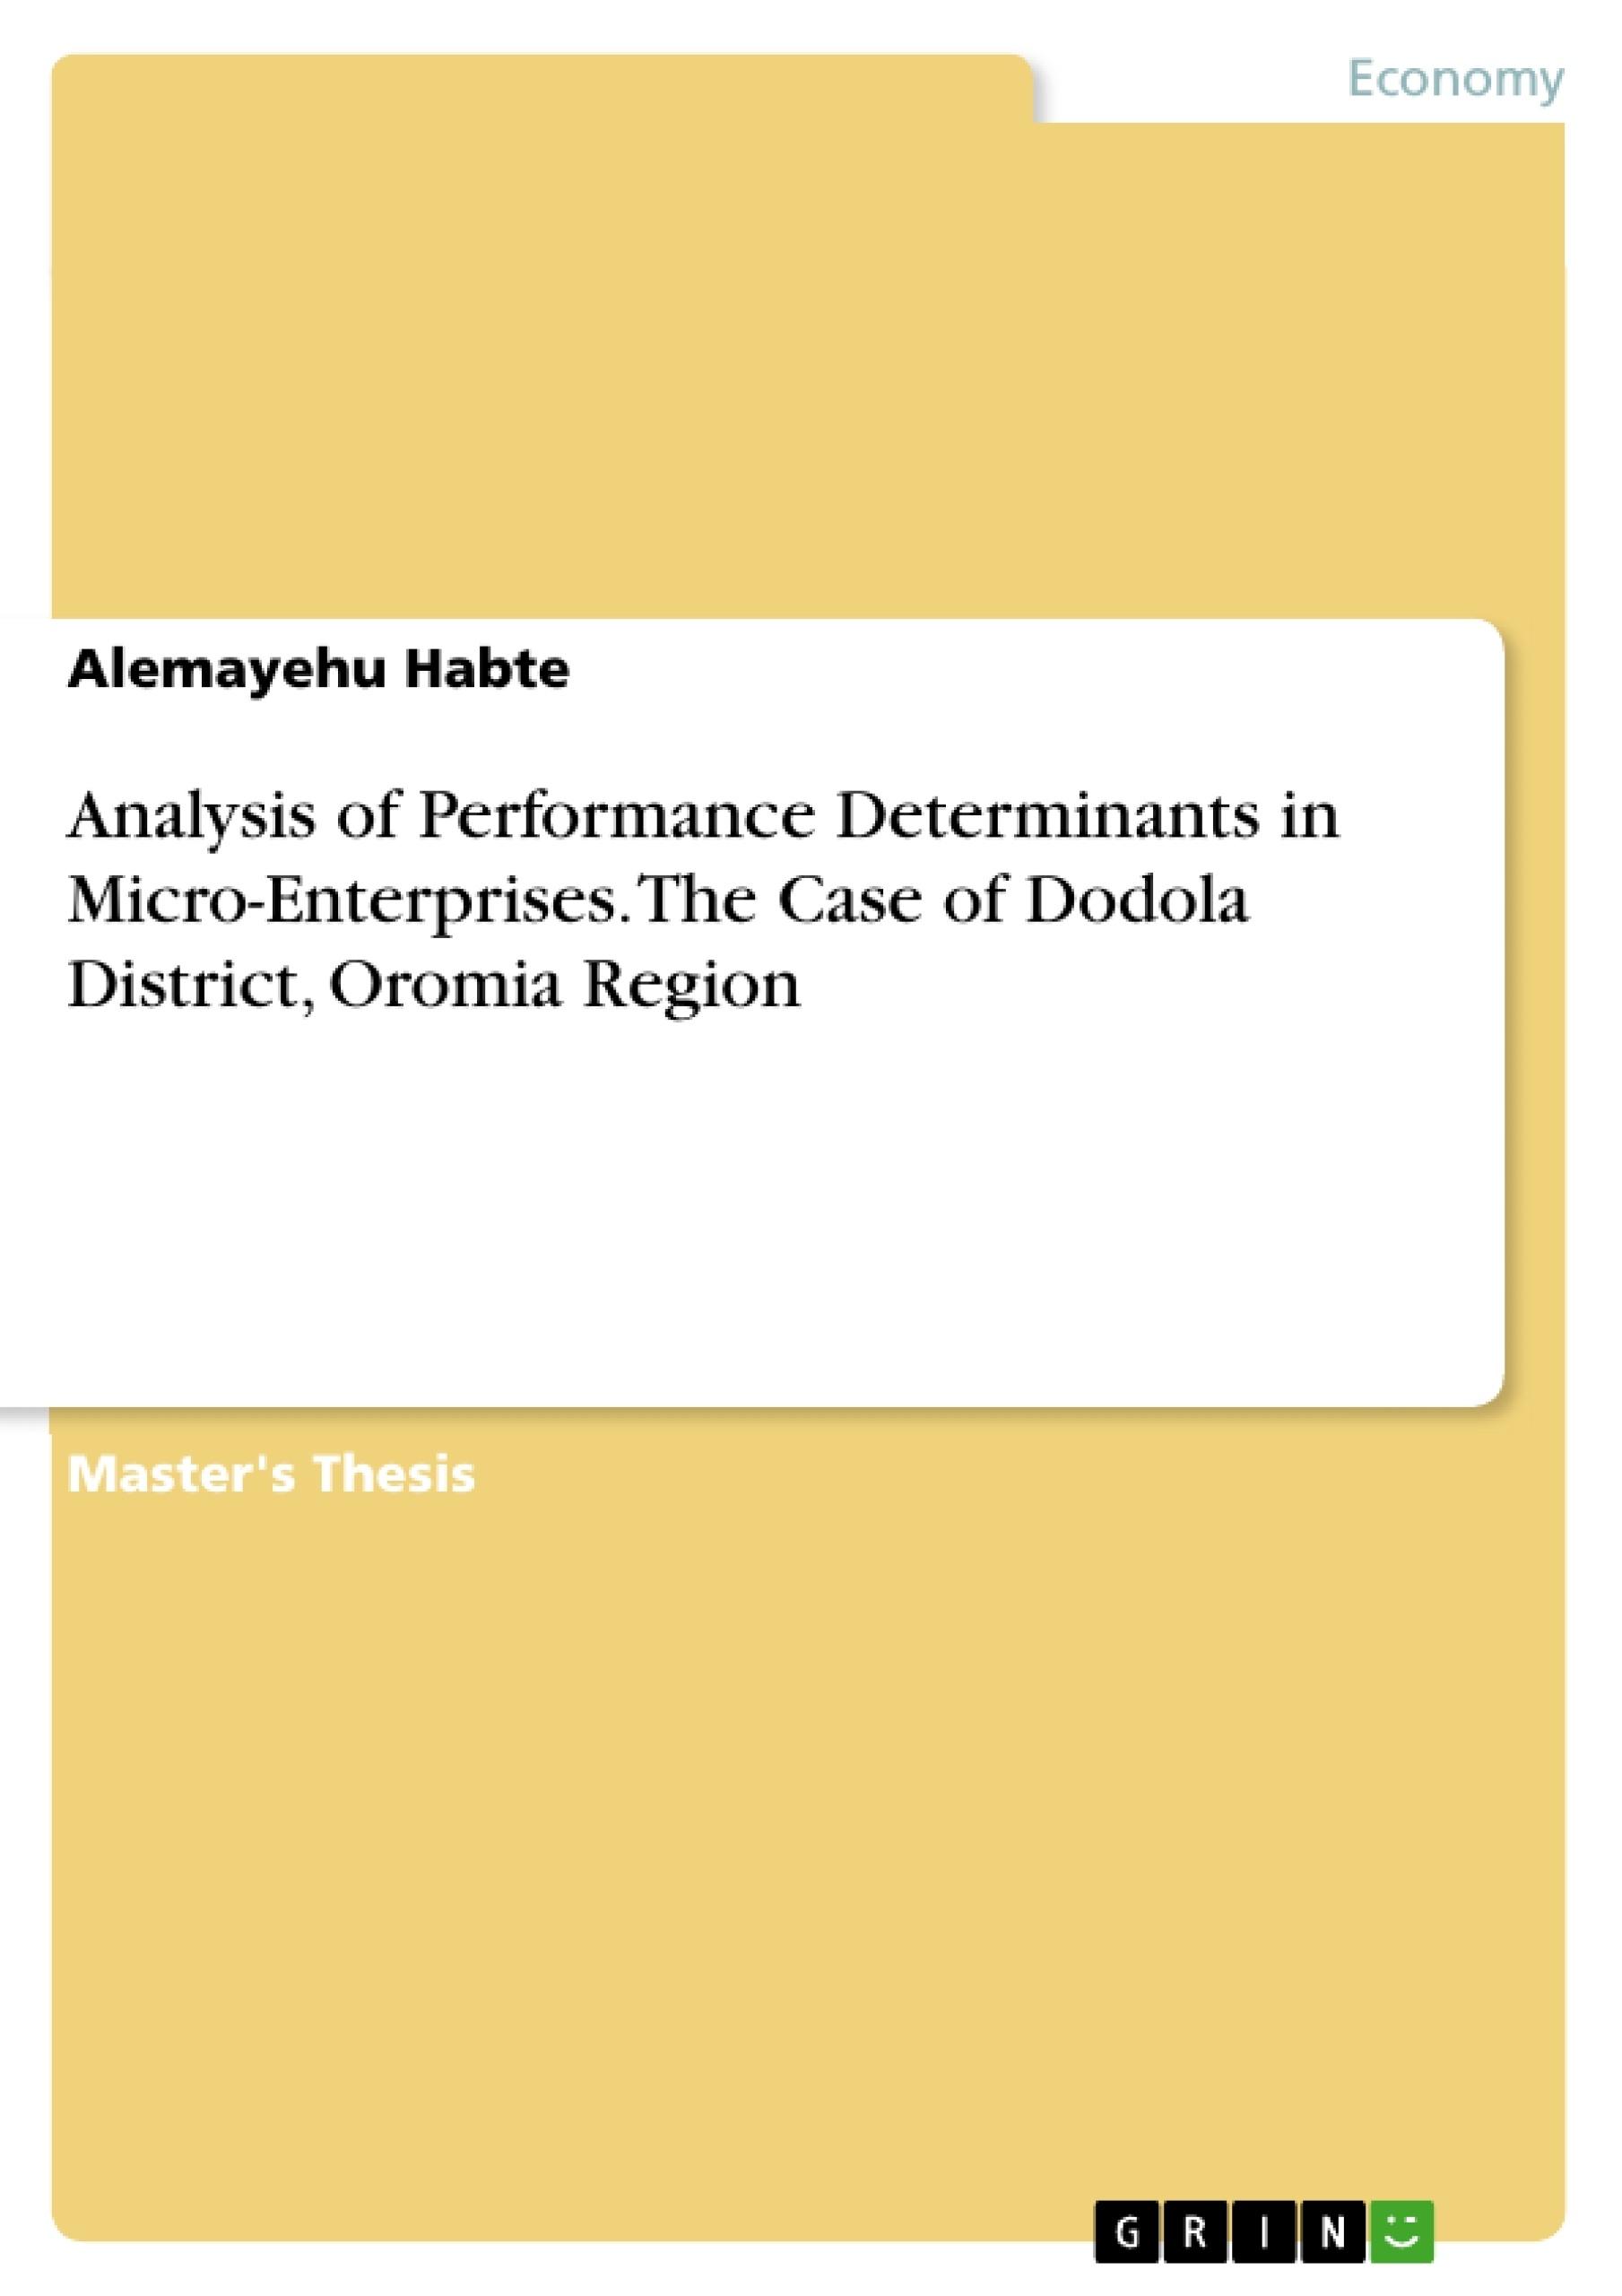 Title: Analysis of Performance Determinants in Micro-Enterprises. The Case of Dodola District, Oromia Region